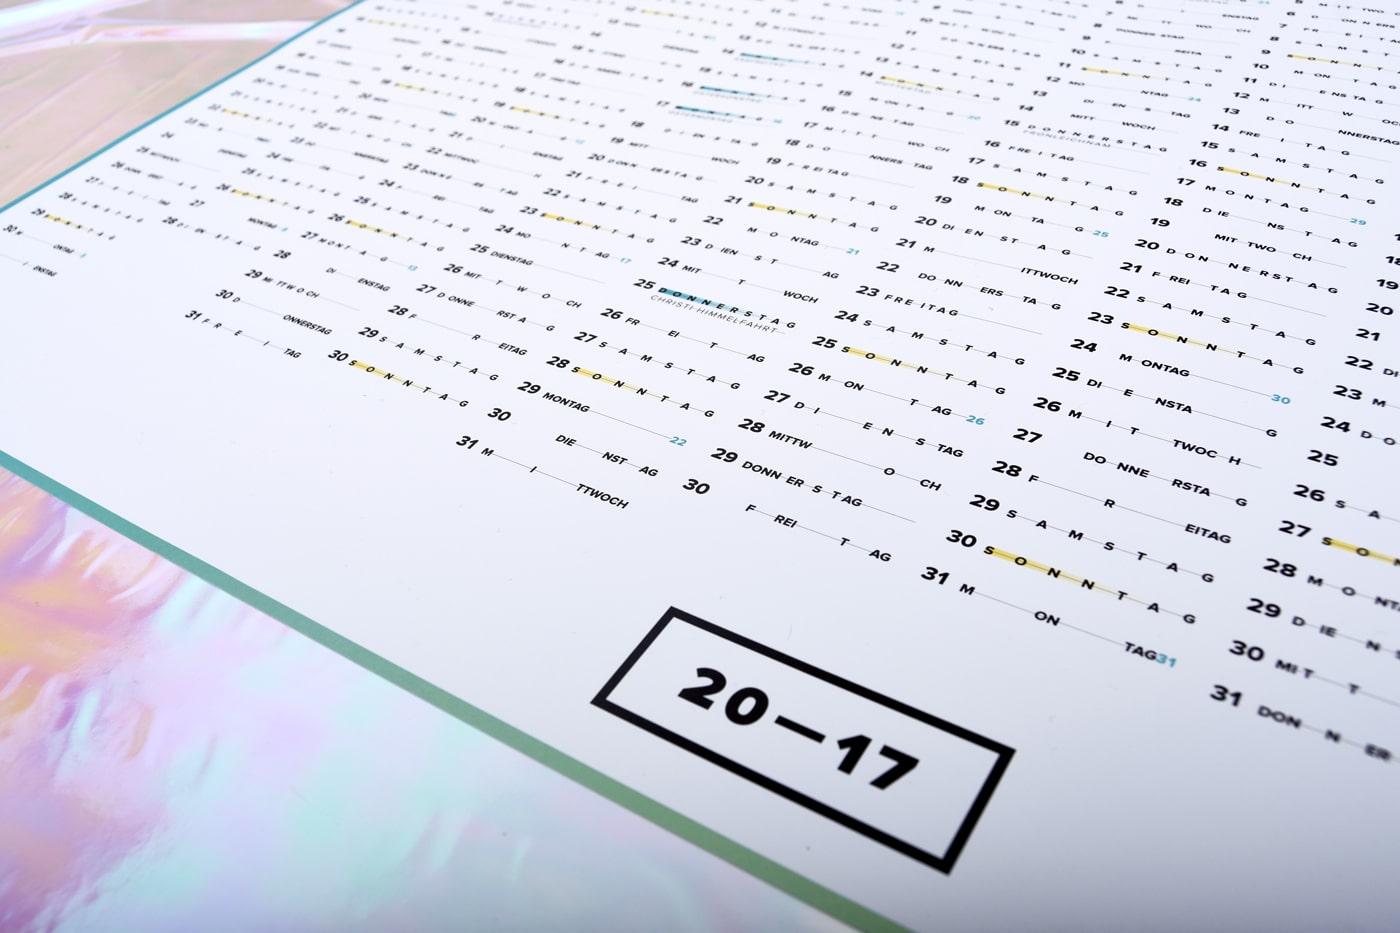 Design Wandkalender Studio Pala 2016